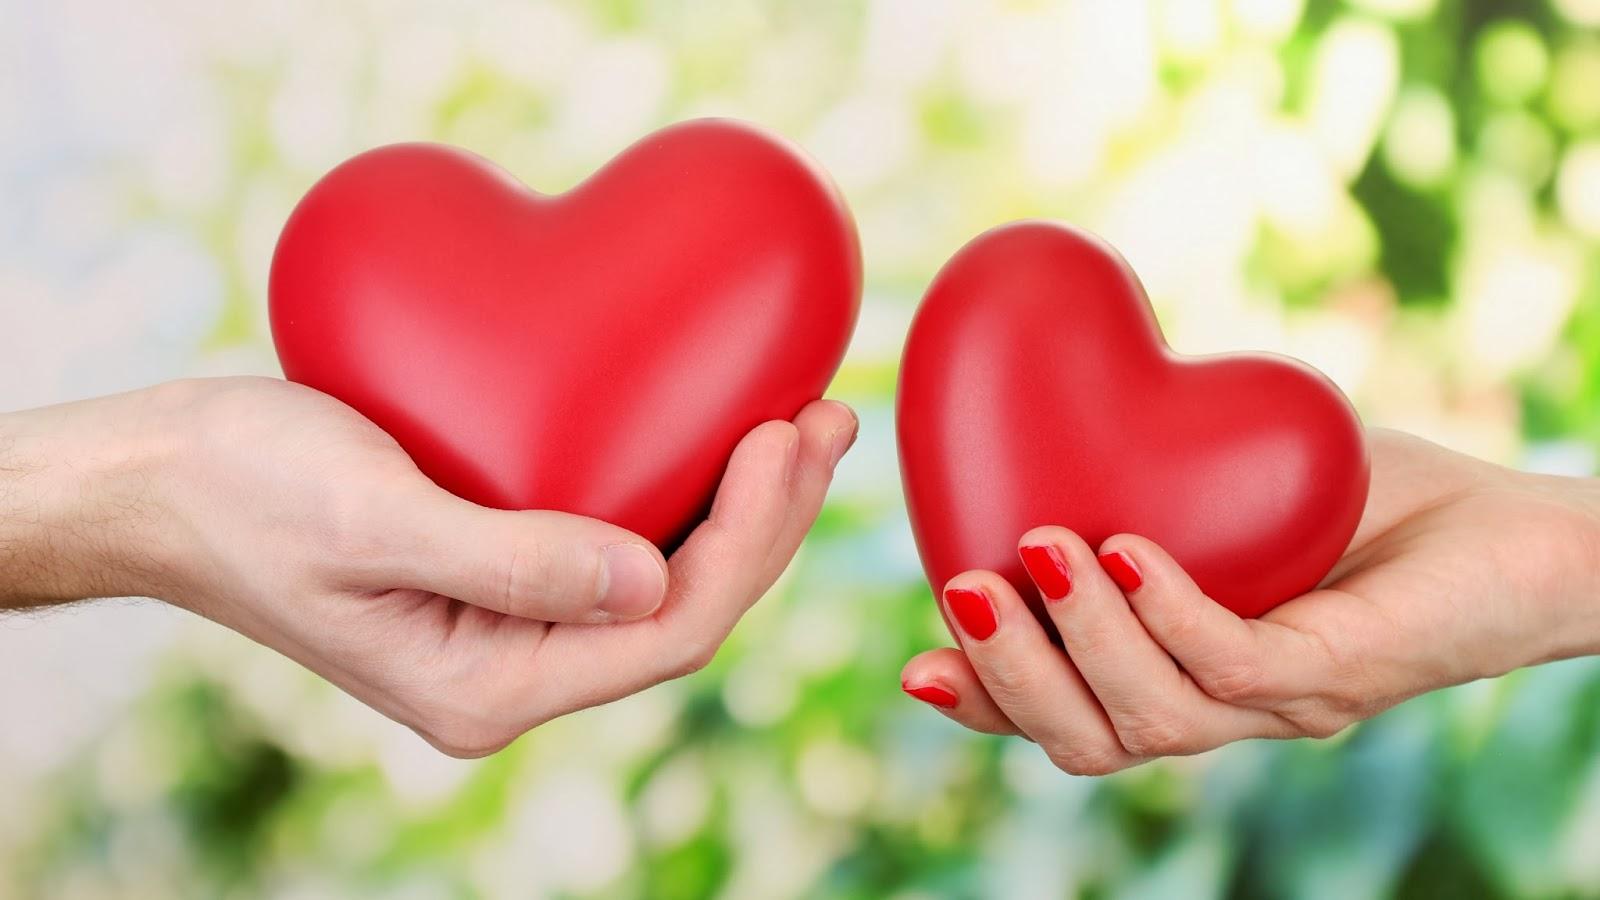 بالصور صور رومانسية صور قلوب حب صور عشاق حب صور قلوب للعشاق , خلفيات رومانسية 3878 4